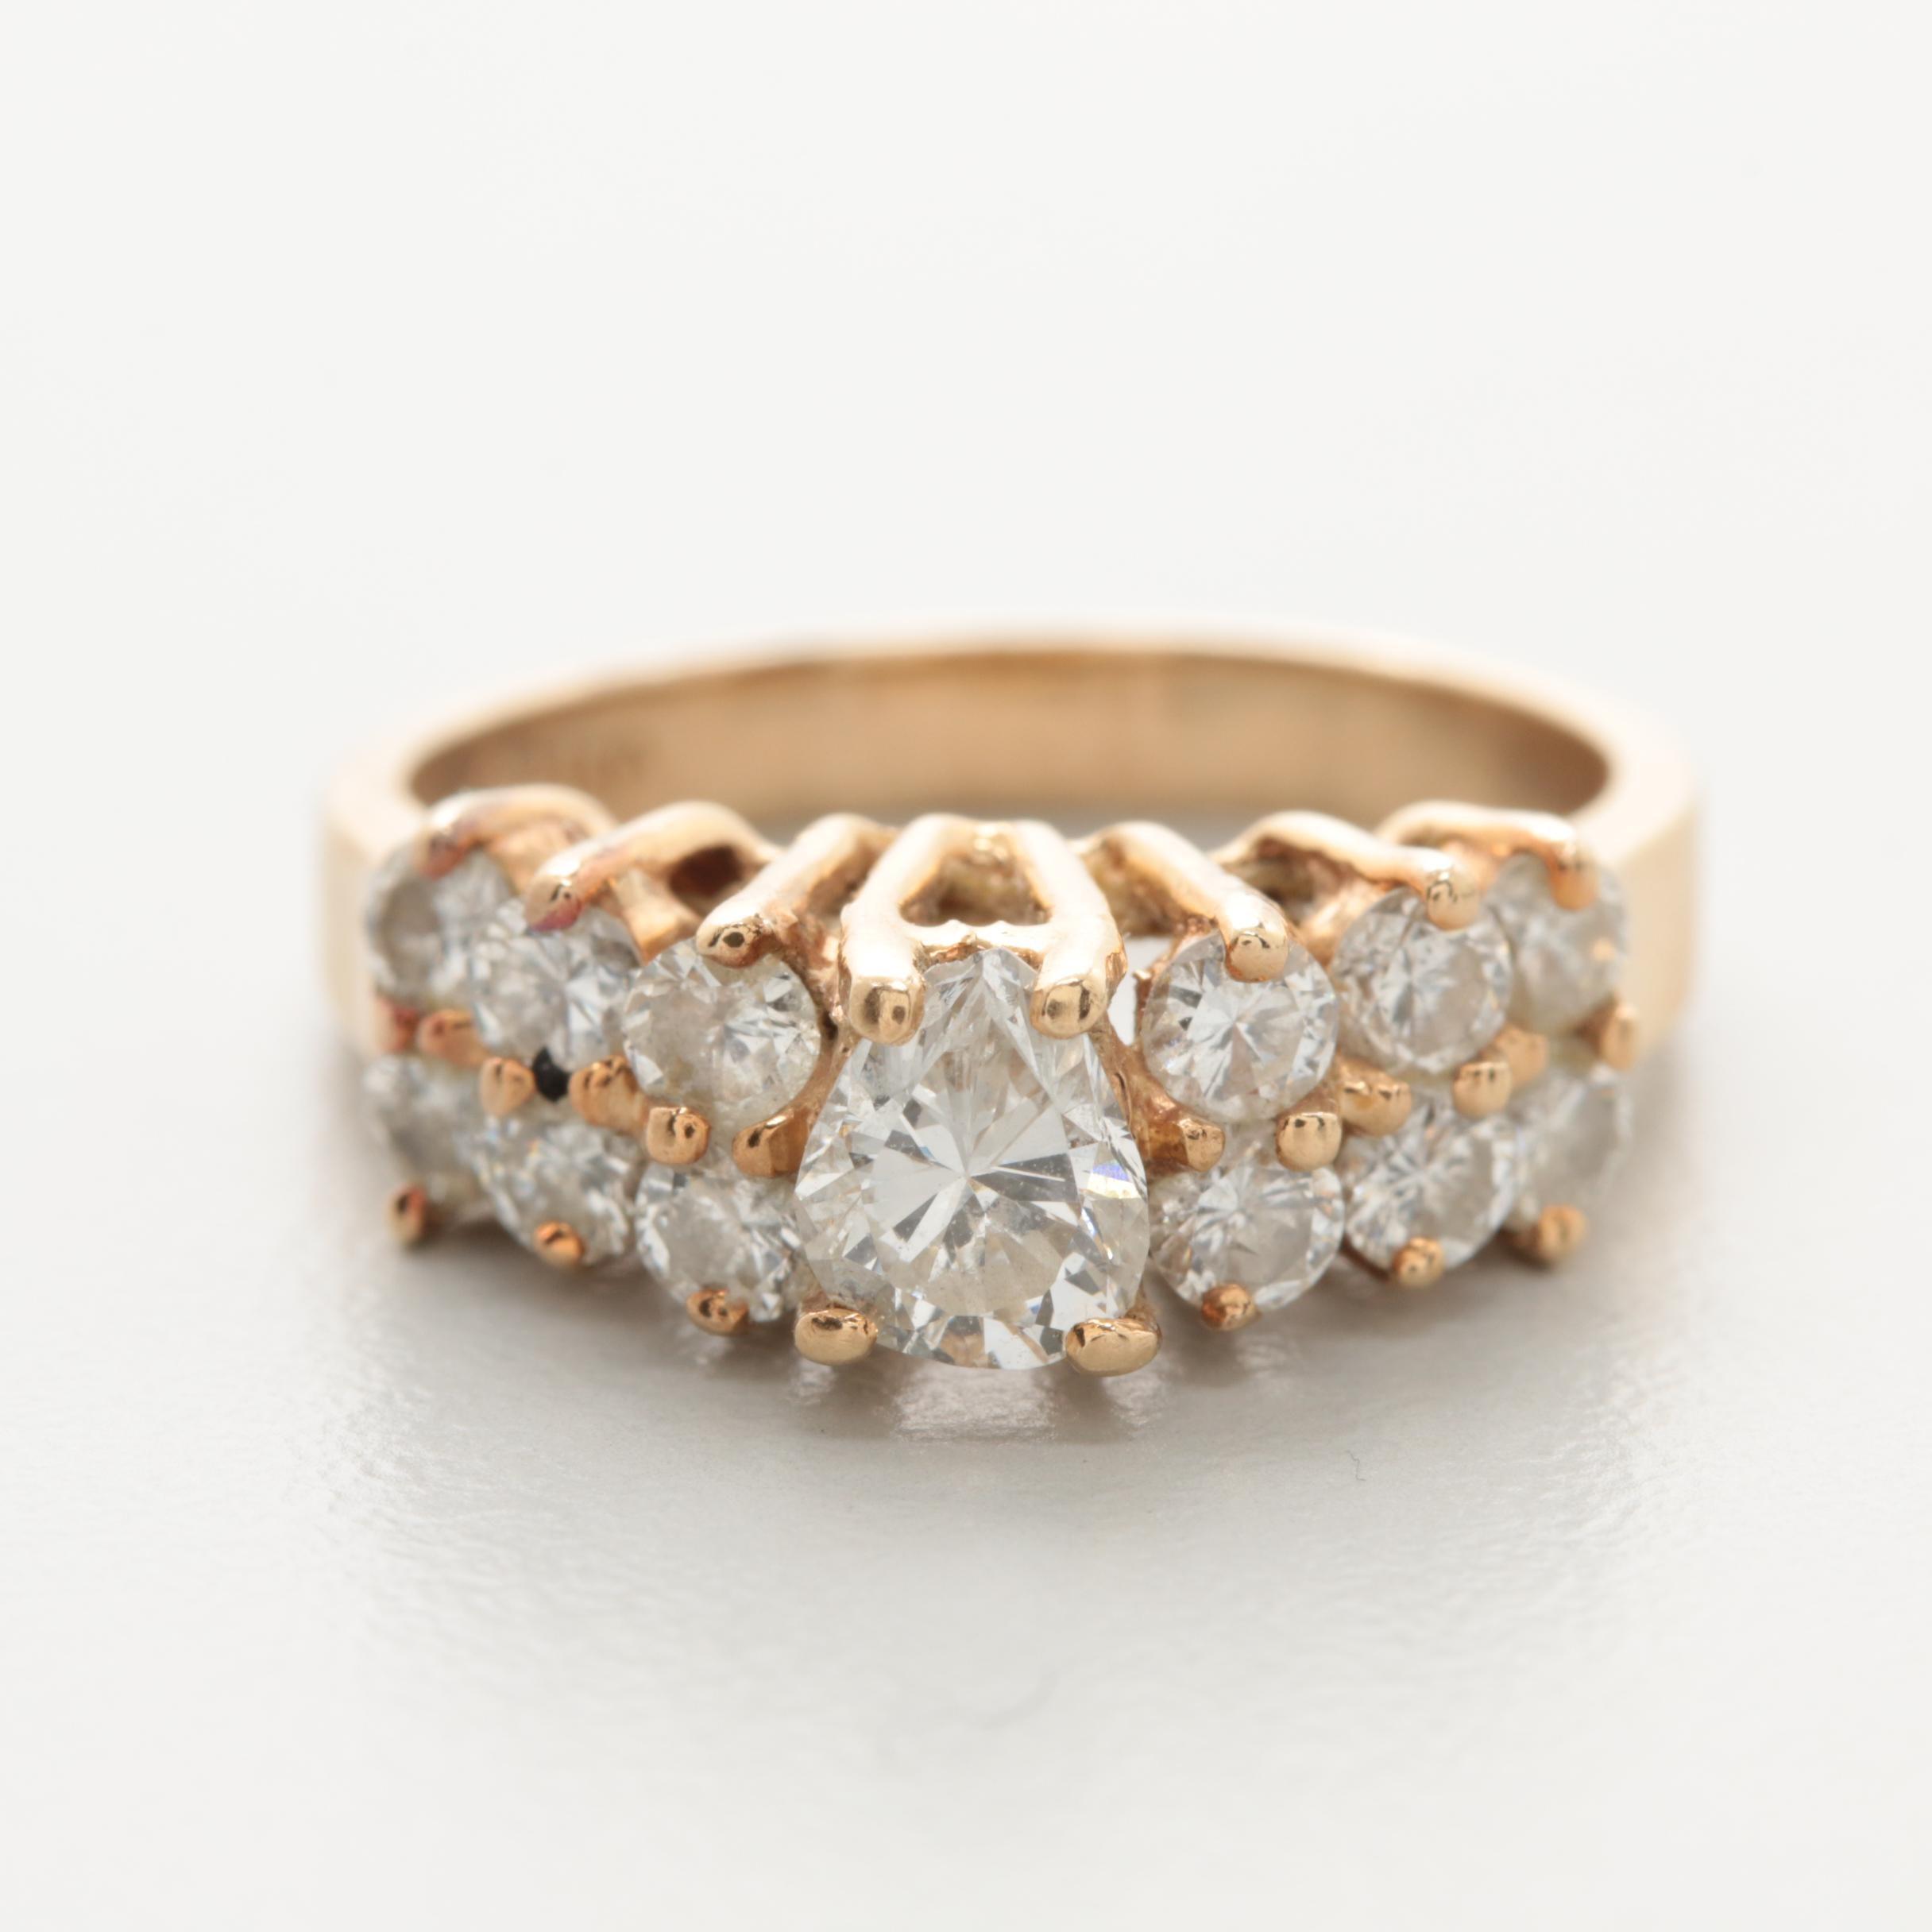 14K Yellow Gold 1.14 CTW Diamond Ring